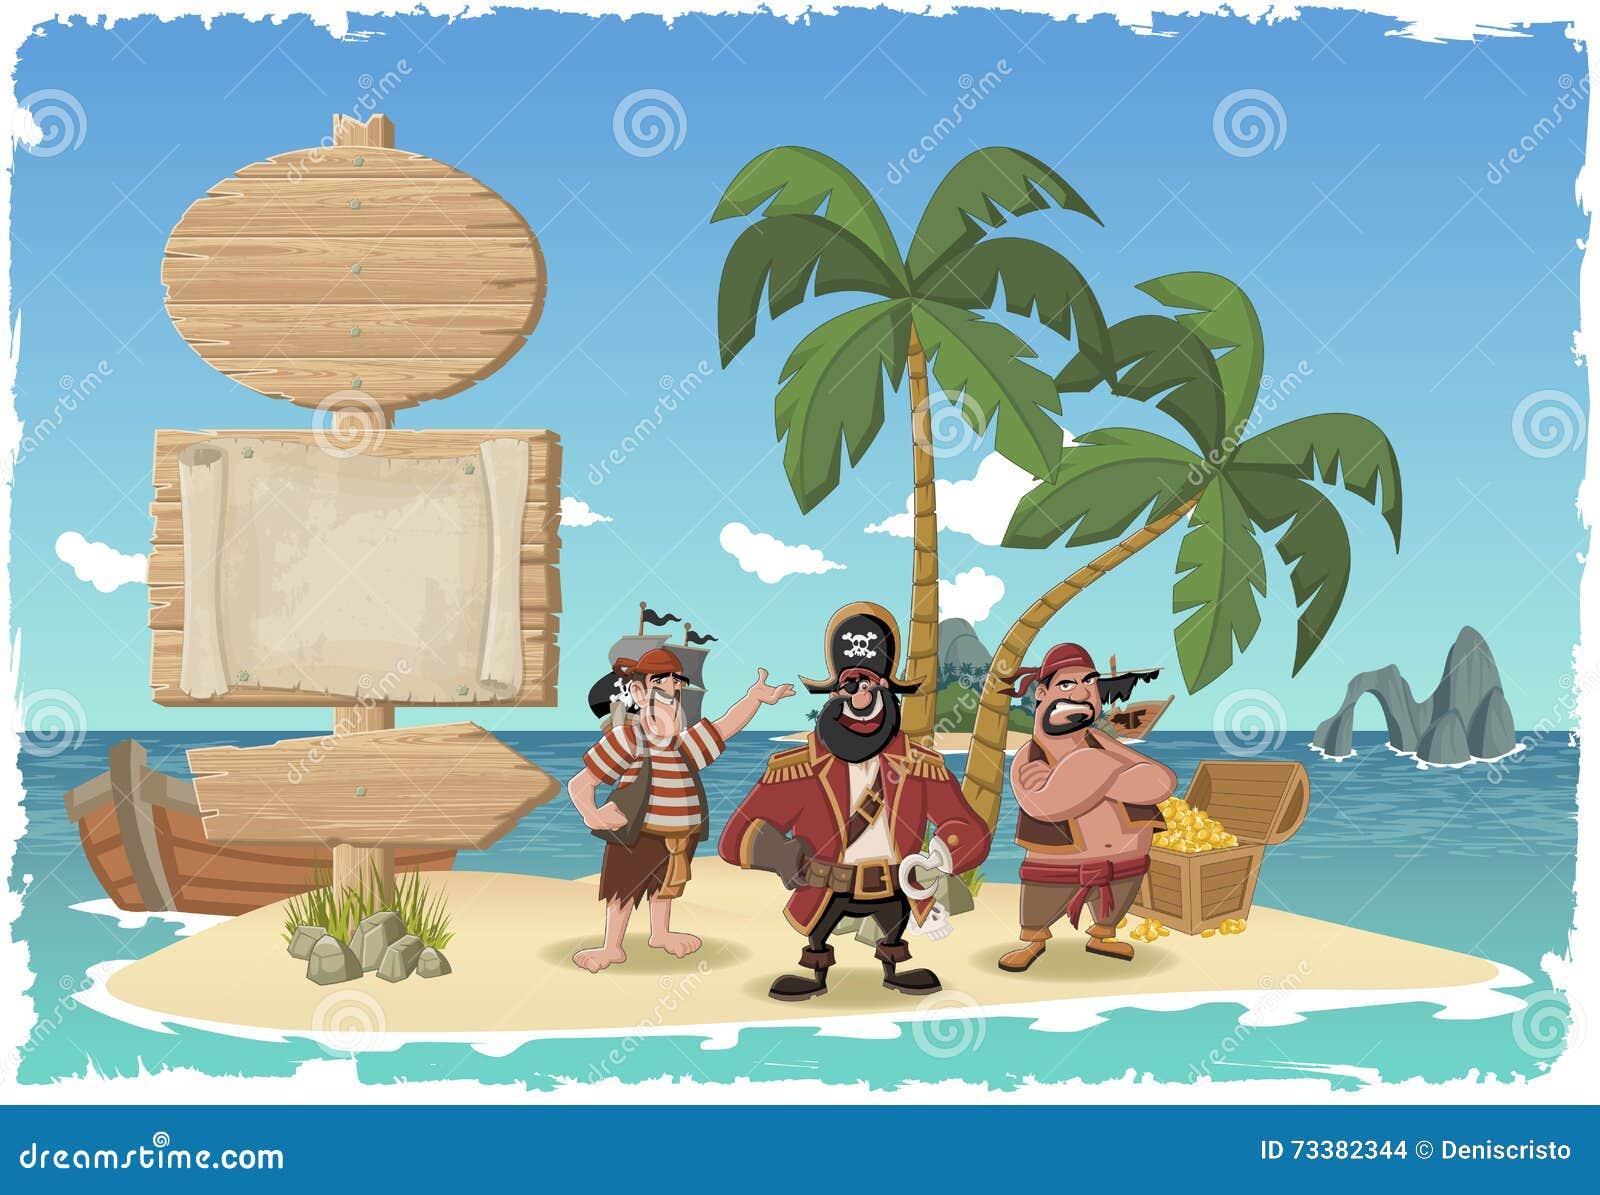 Tropical Island Cartoon: Beautiful Tropical Island With Cartoon Pirates. Vector